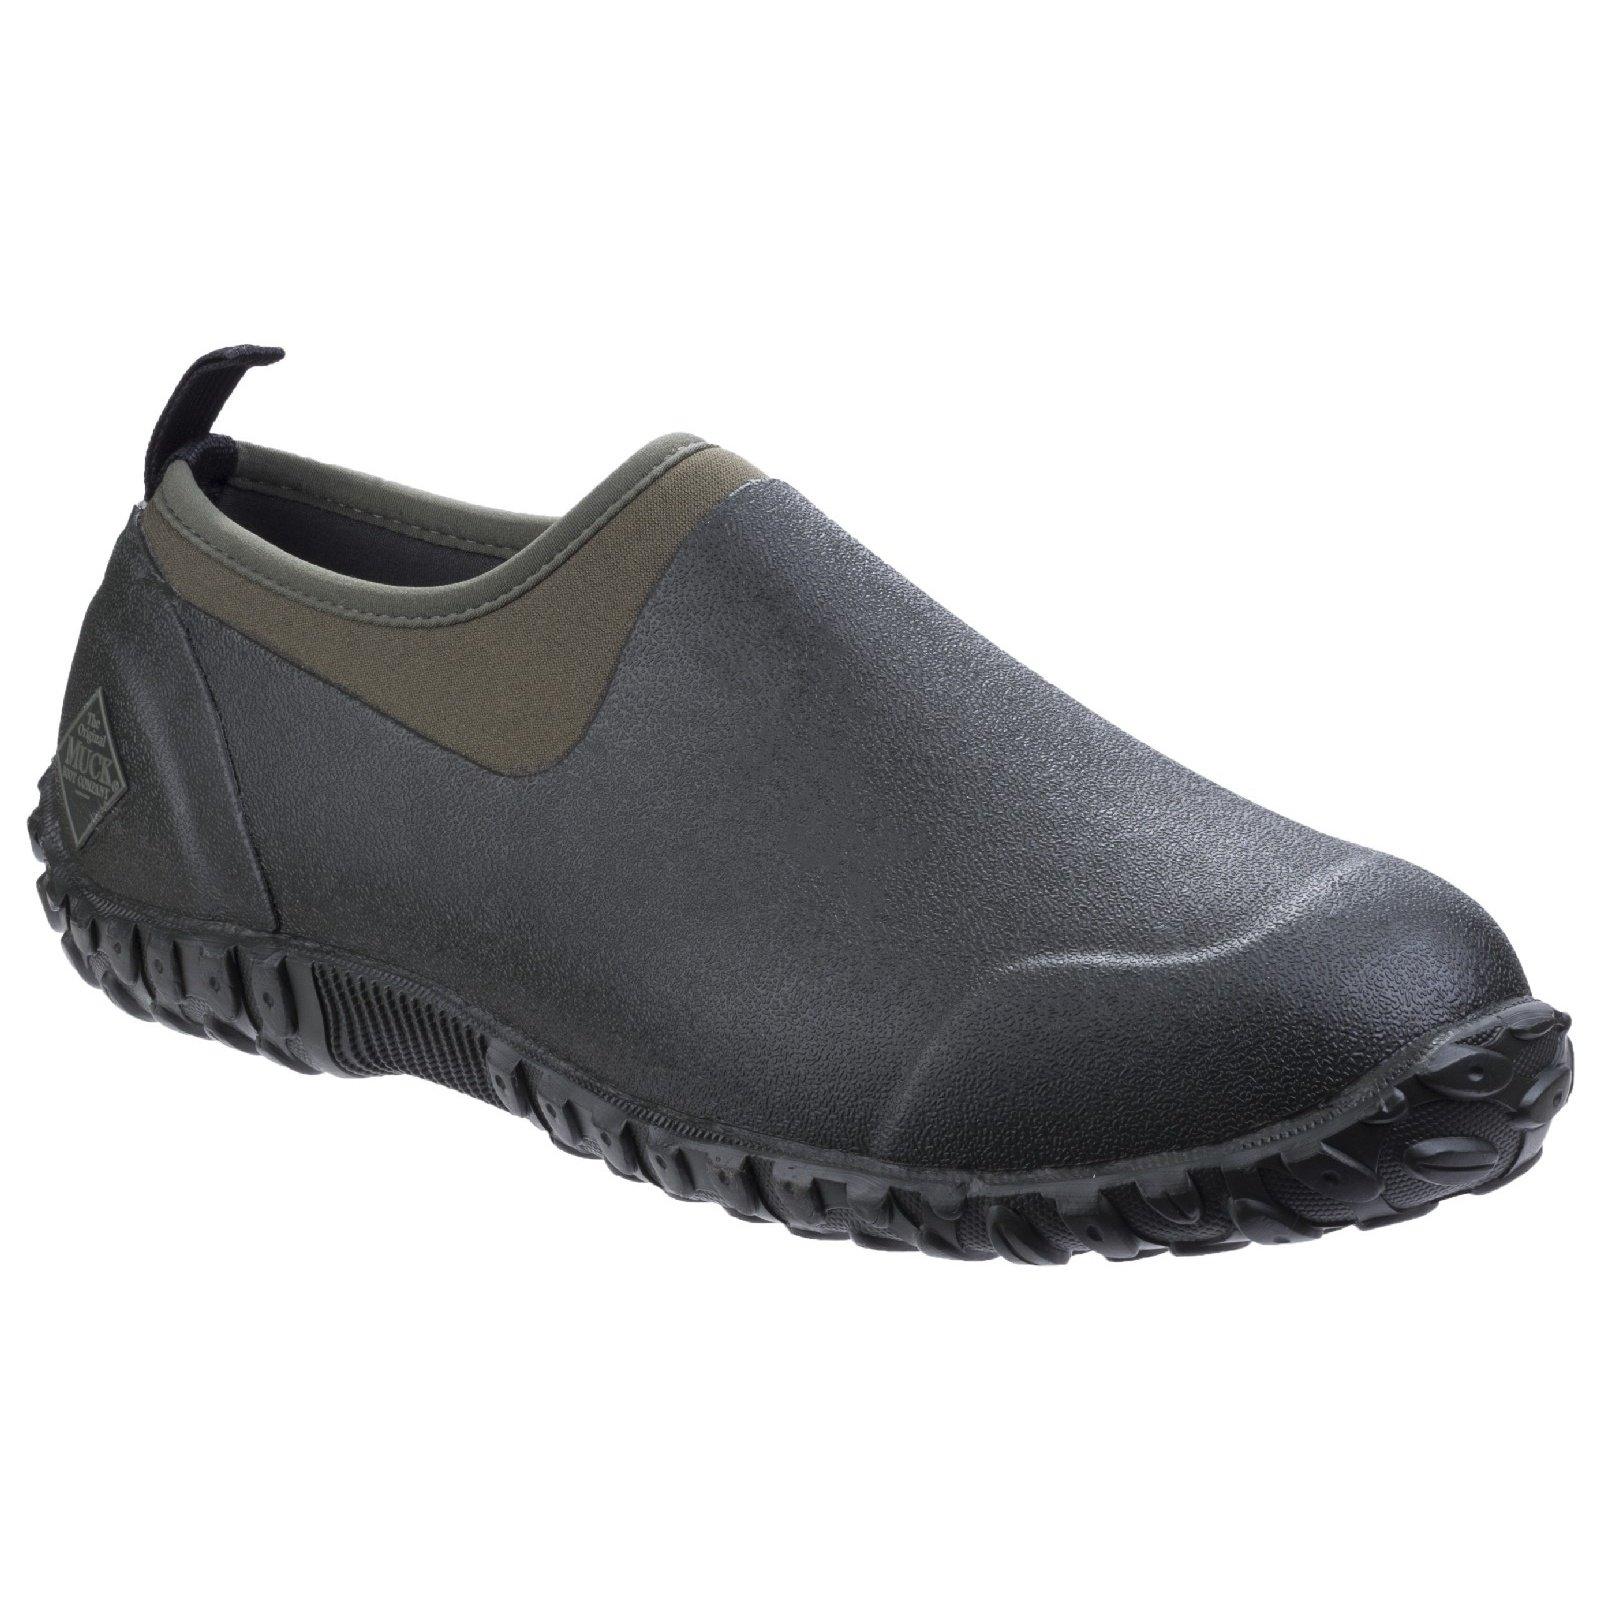 Muck Boot Mens Muckster II Low All Purpose Lightweight Shoes (13 US) (Moss/Green) by Muck Boot